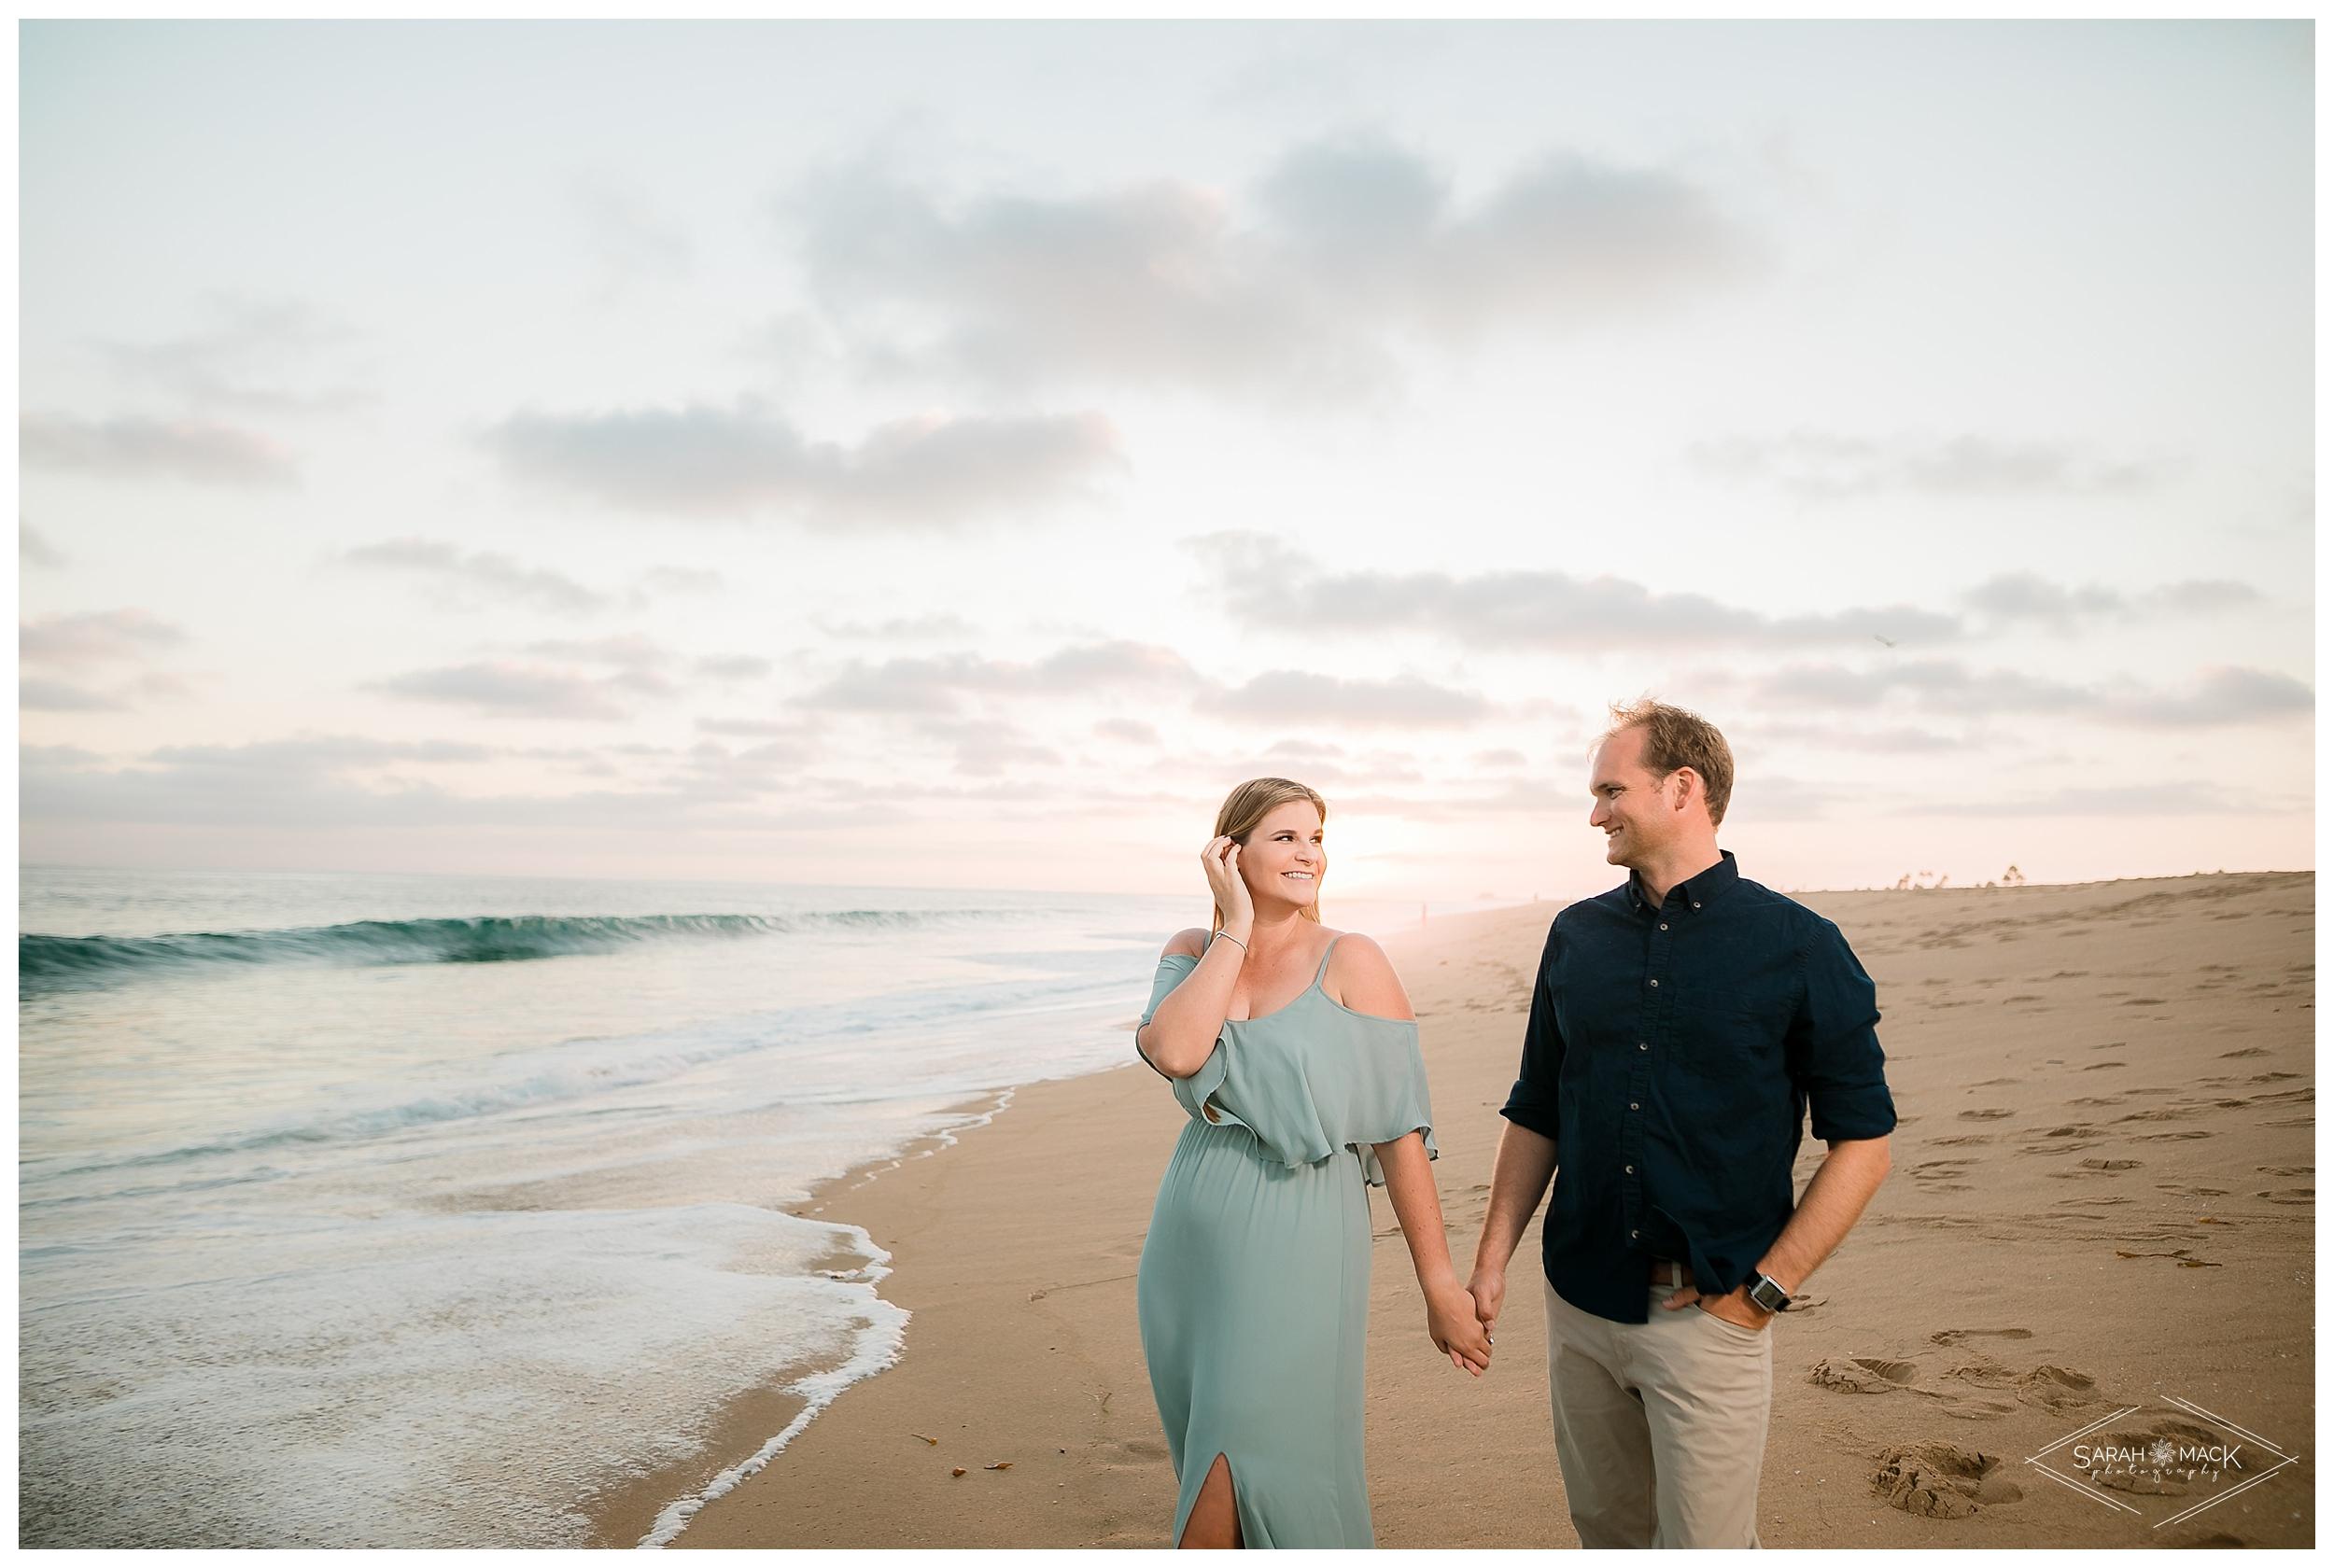 HI_Balboa_Island_Newport-Beach-Engagement-Photography-033.jpg